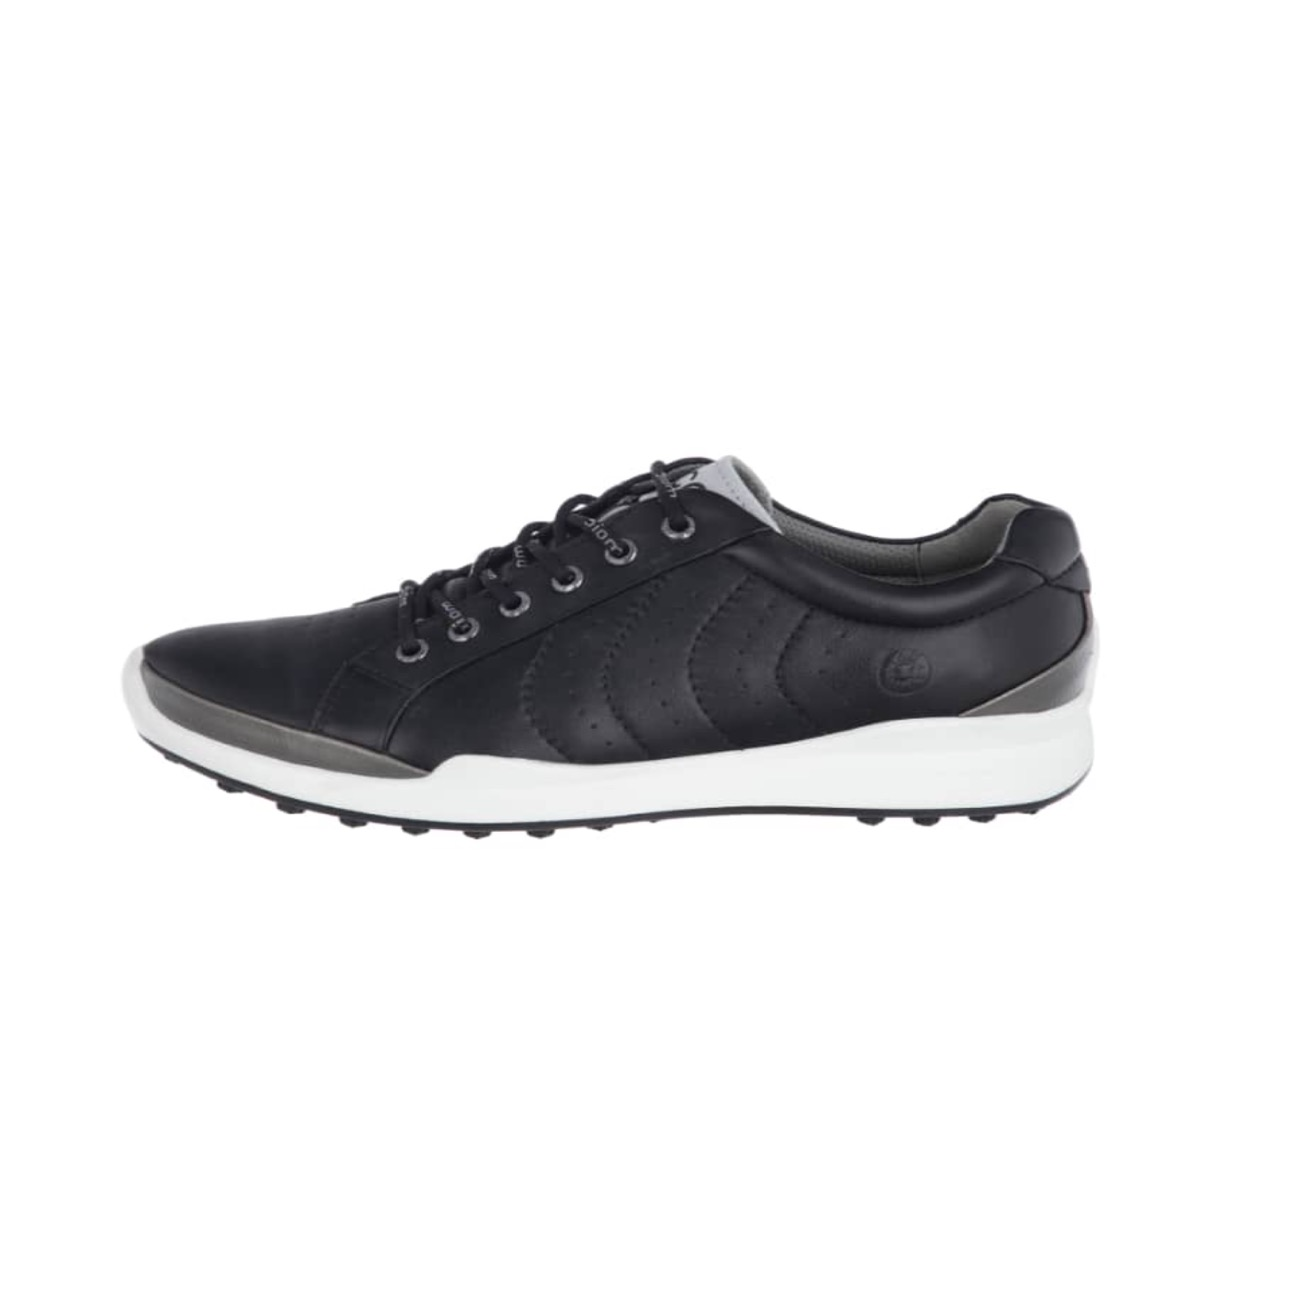 کفش راحتی مردانه اکو کد 13161401152